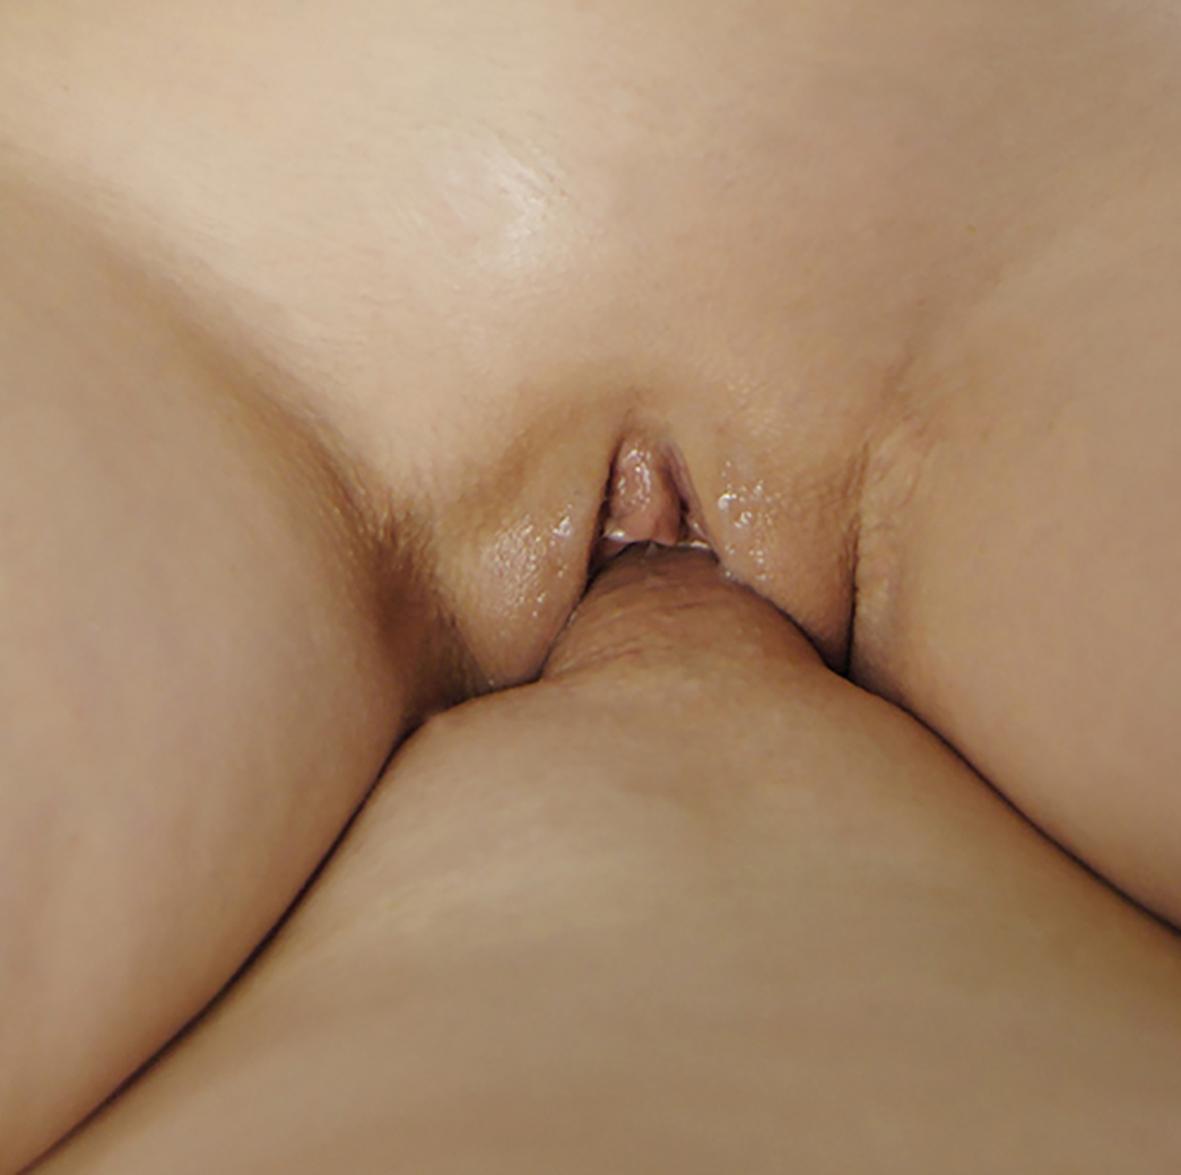 Insertion vaginal intercourse